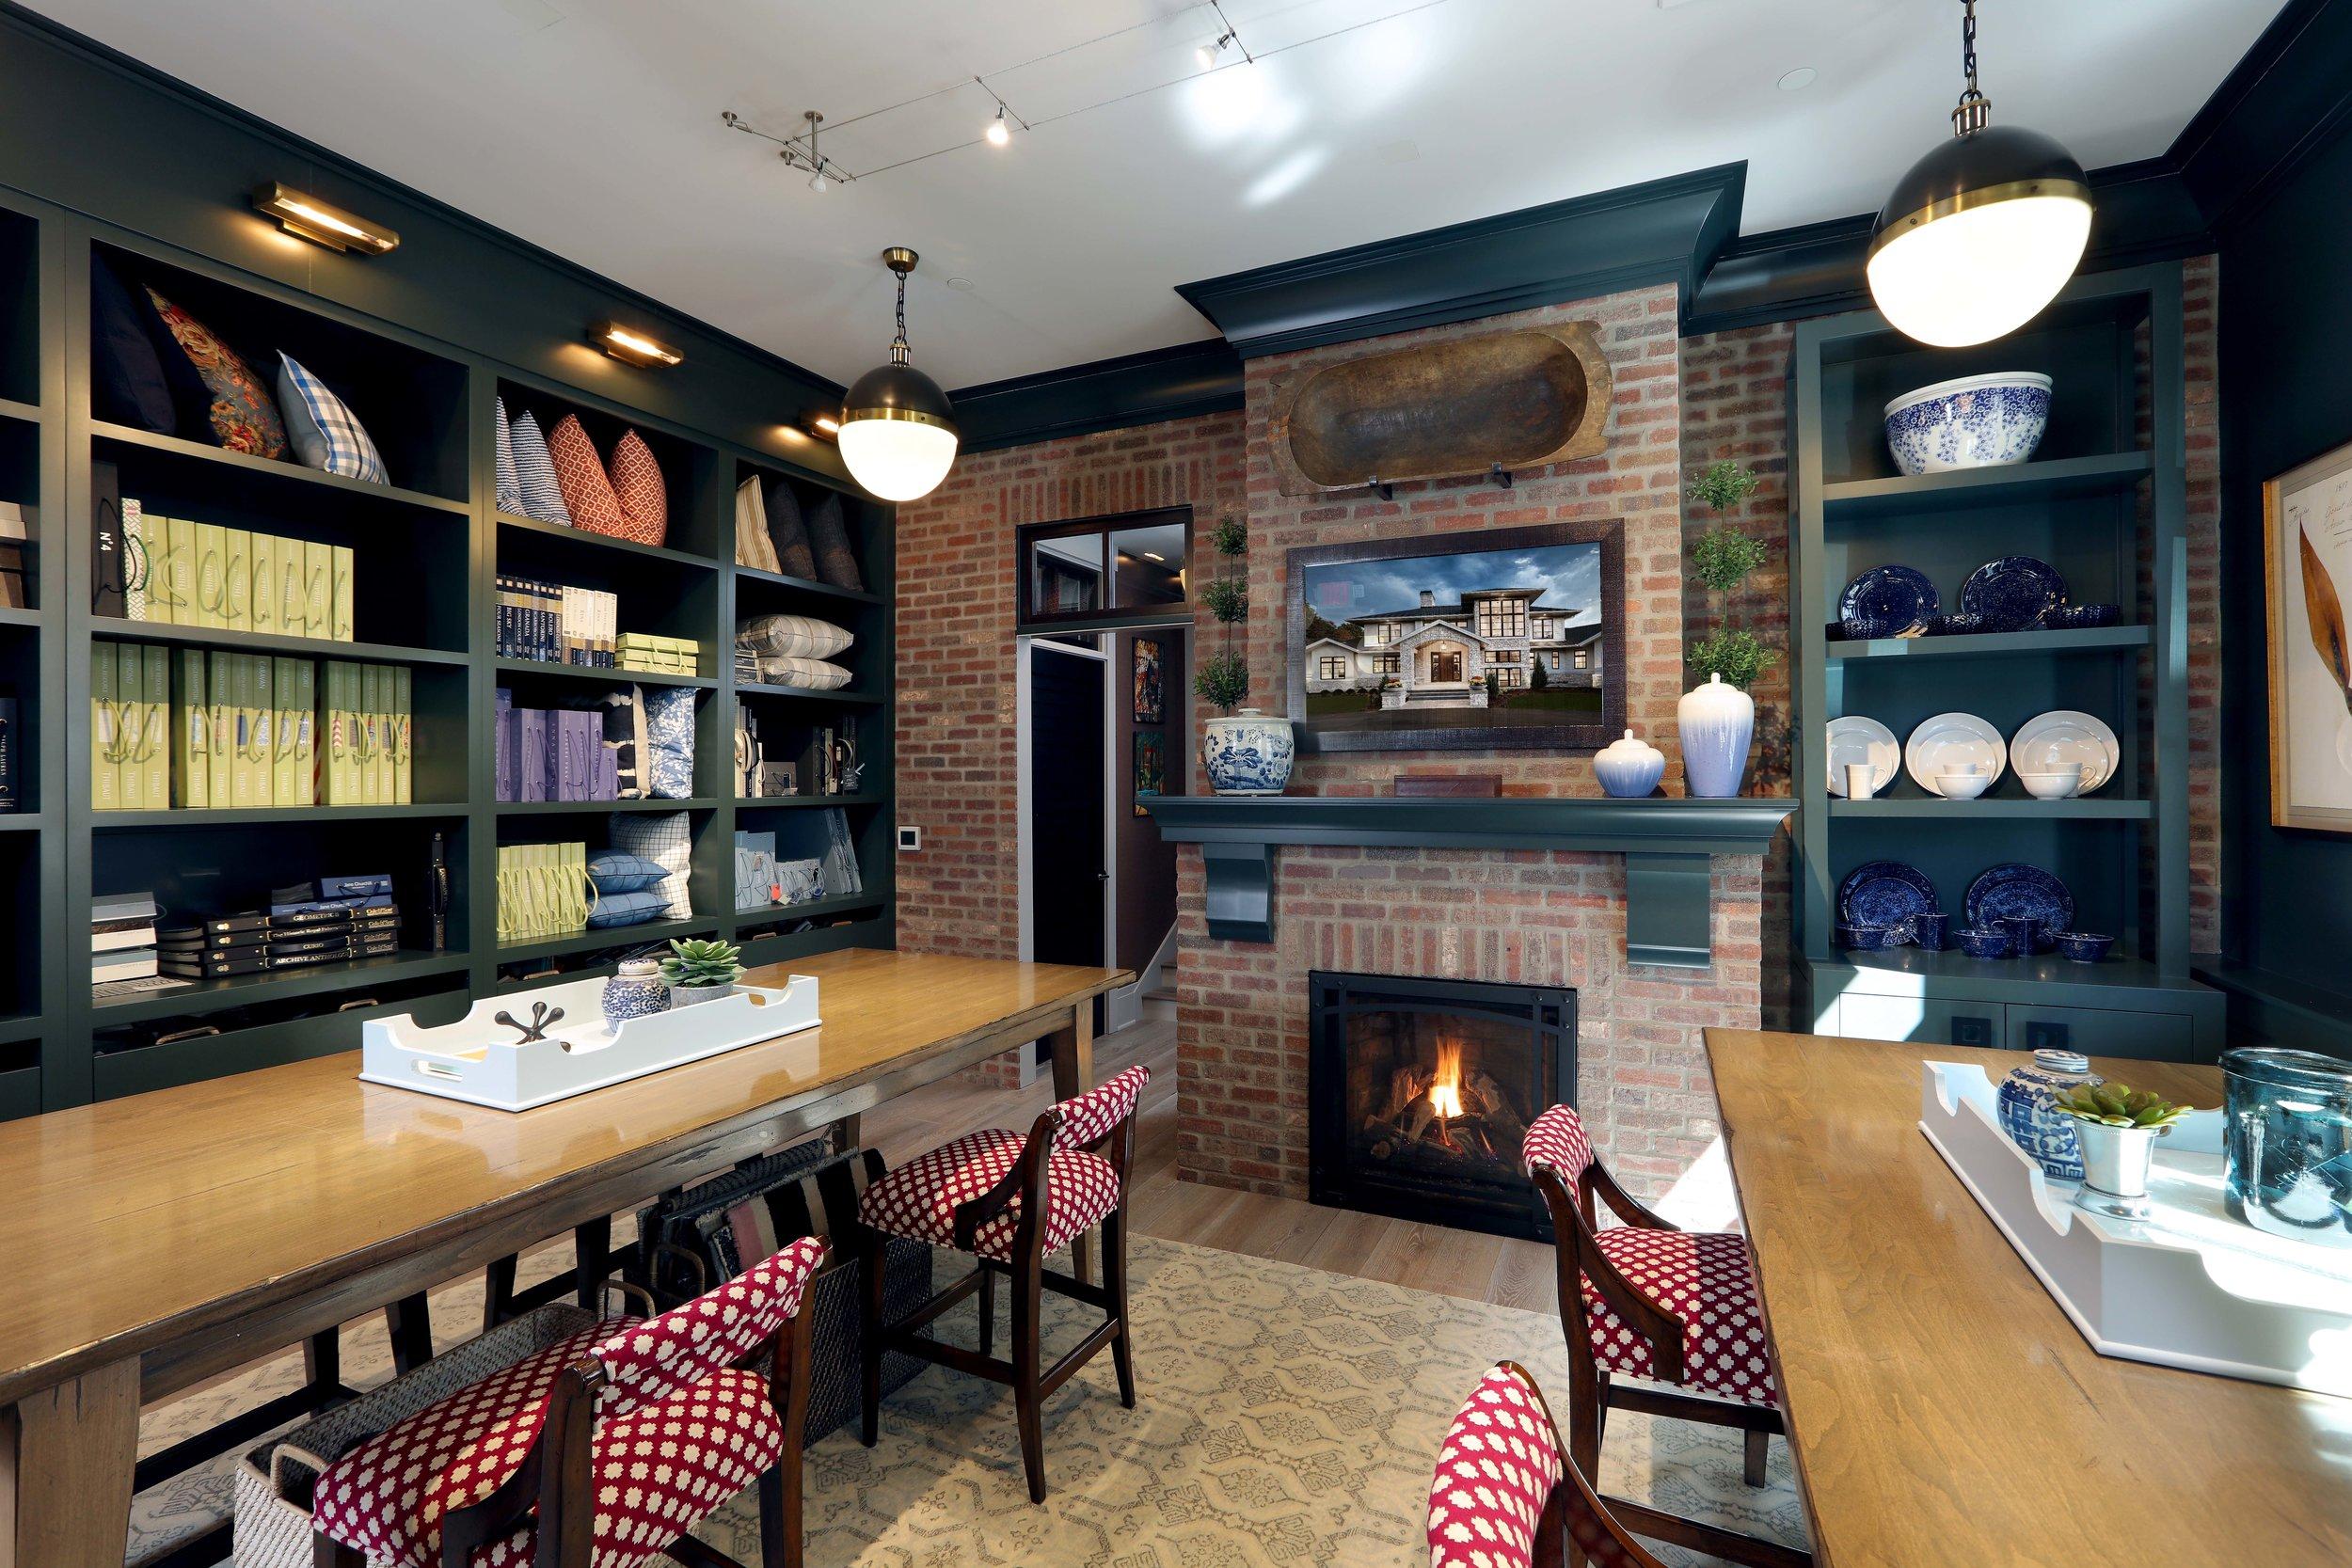 Vision-Interiors-Visbeen-Showroom-Grand-Rapids-Resource-Design.jpg